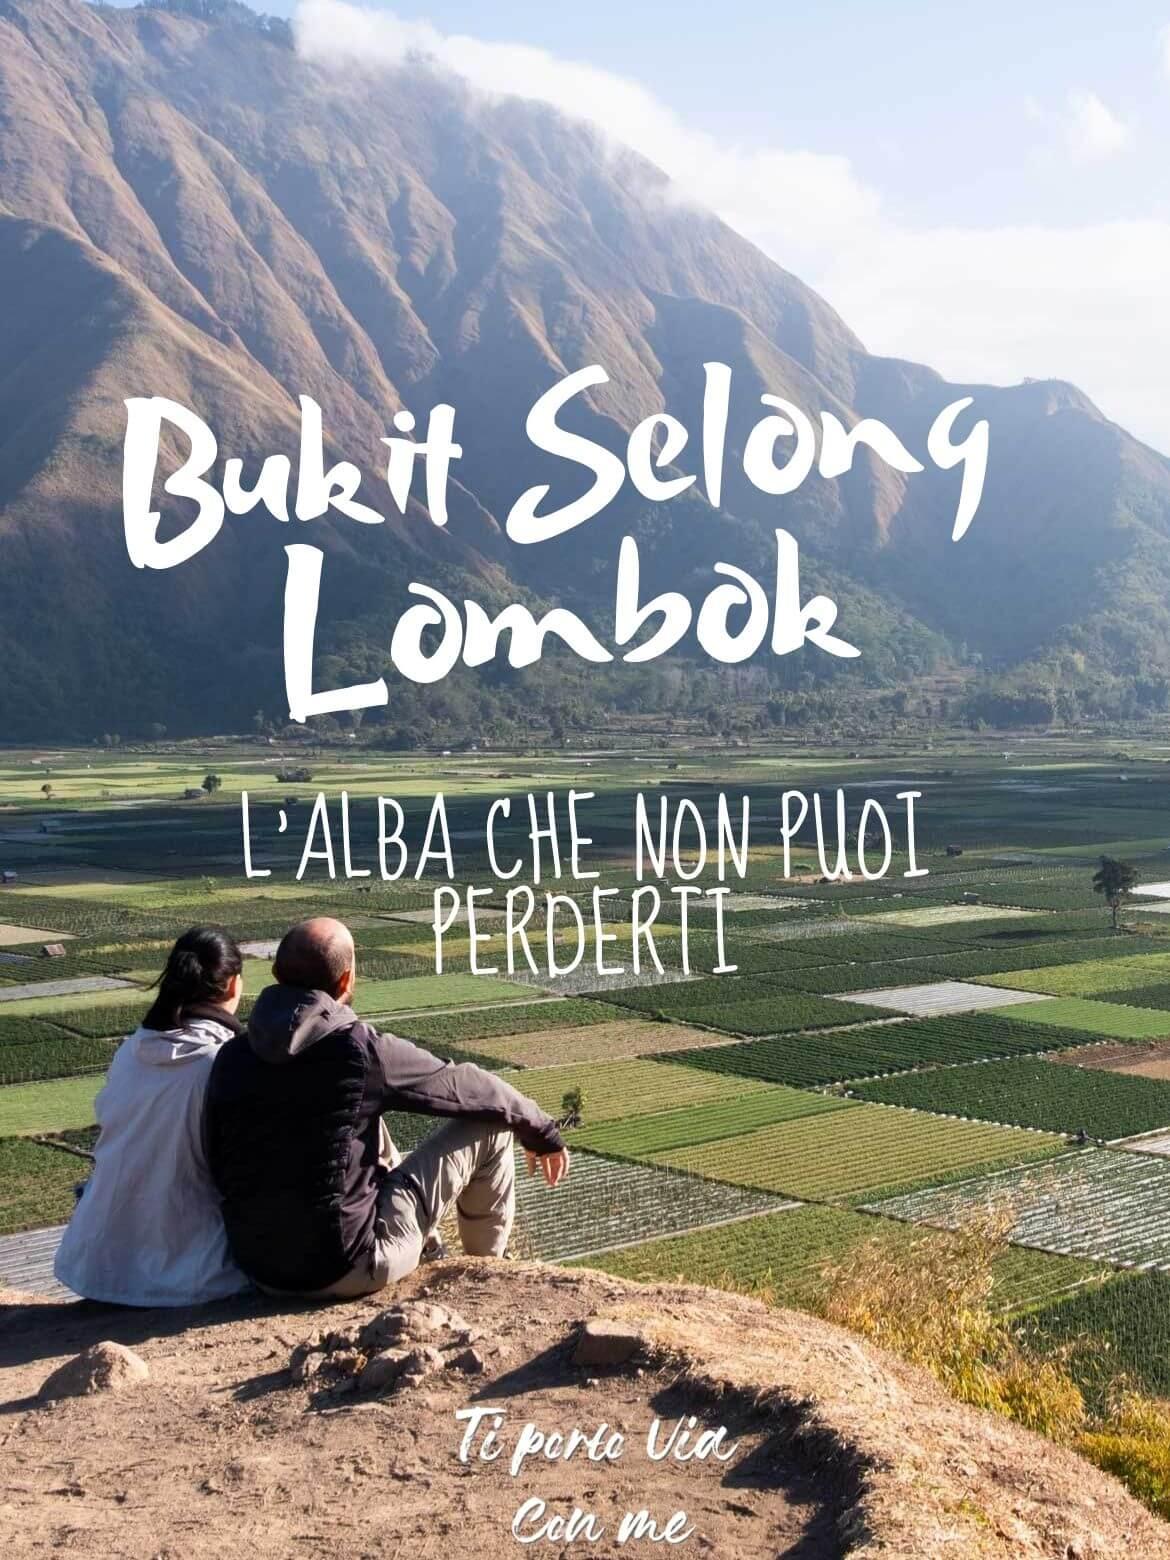 Bukit Selong Lombok Pinterest